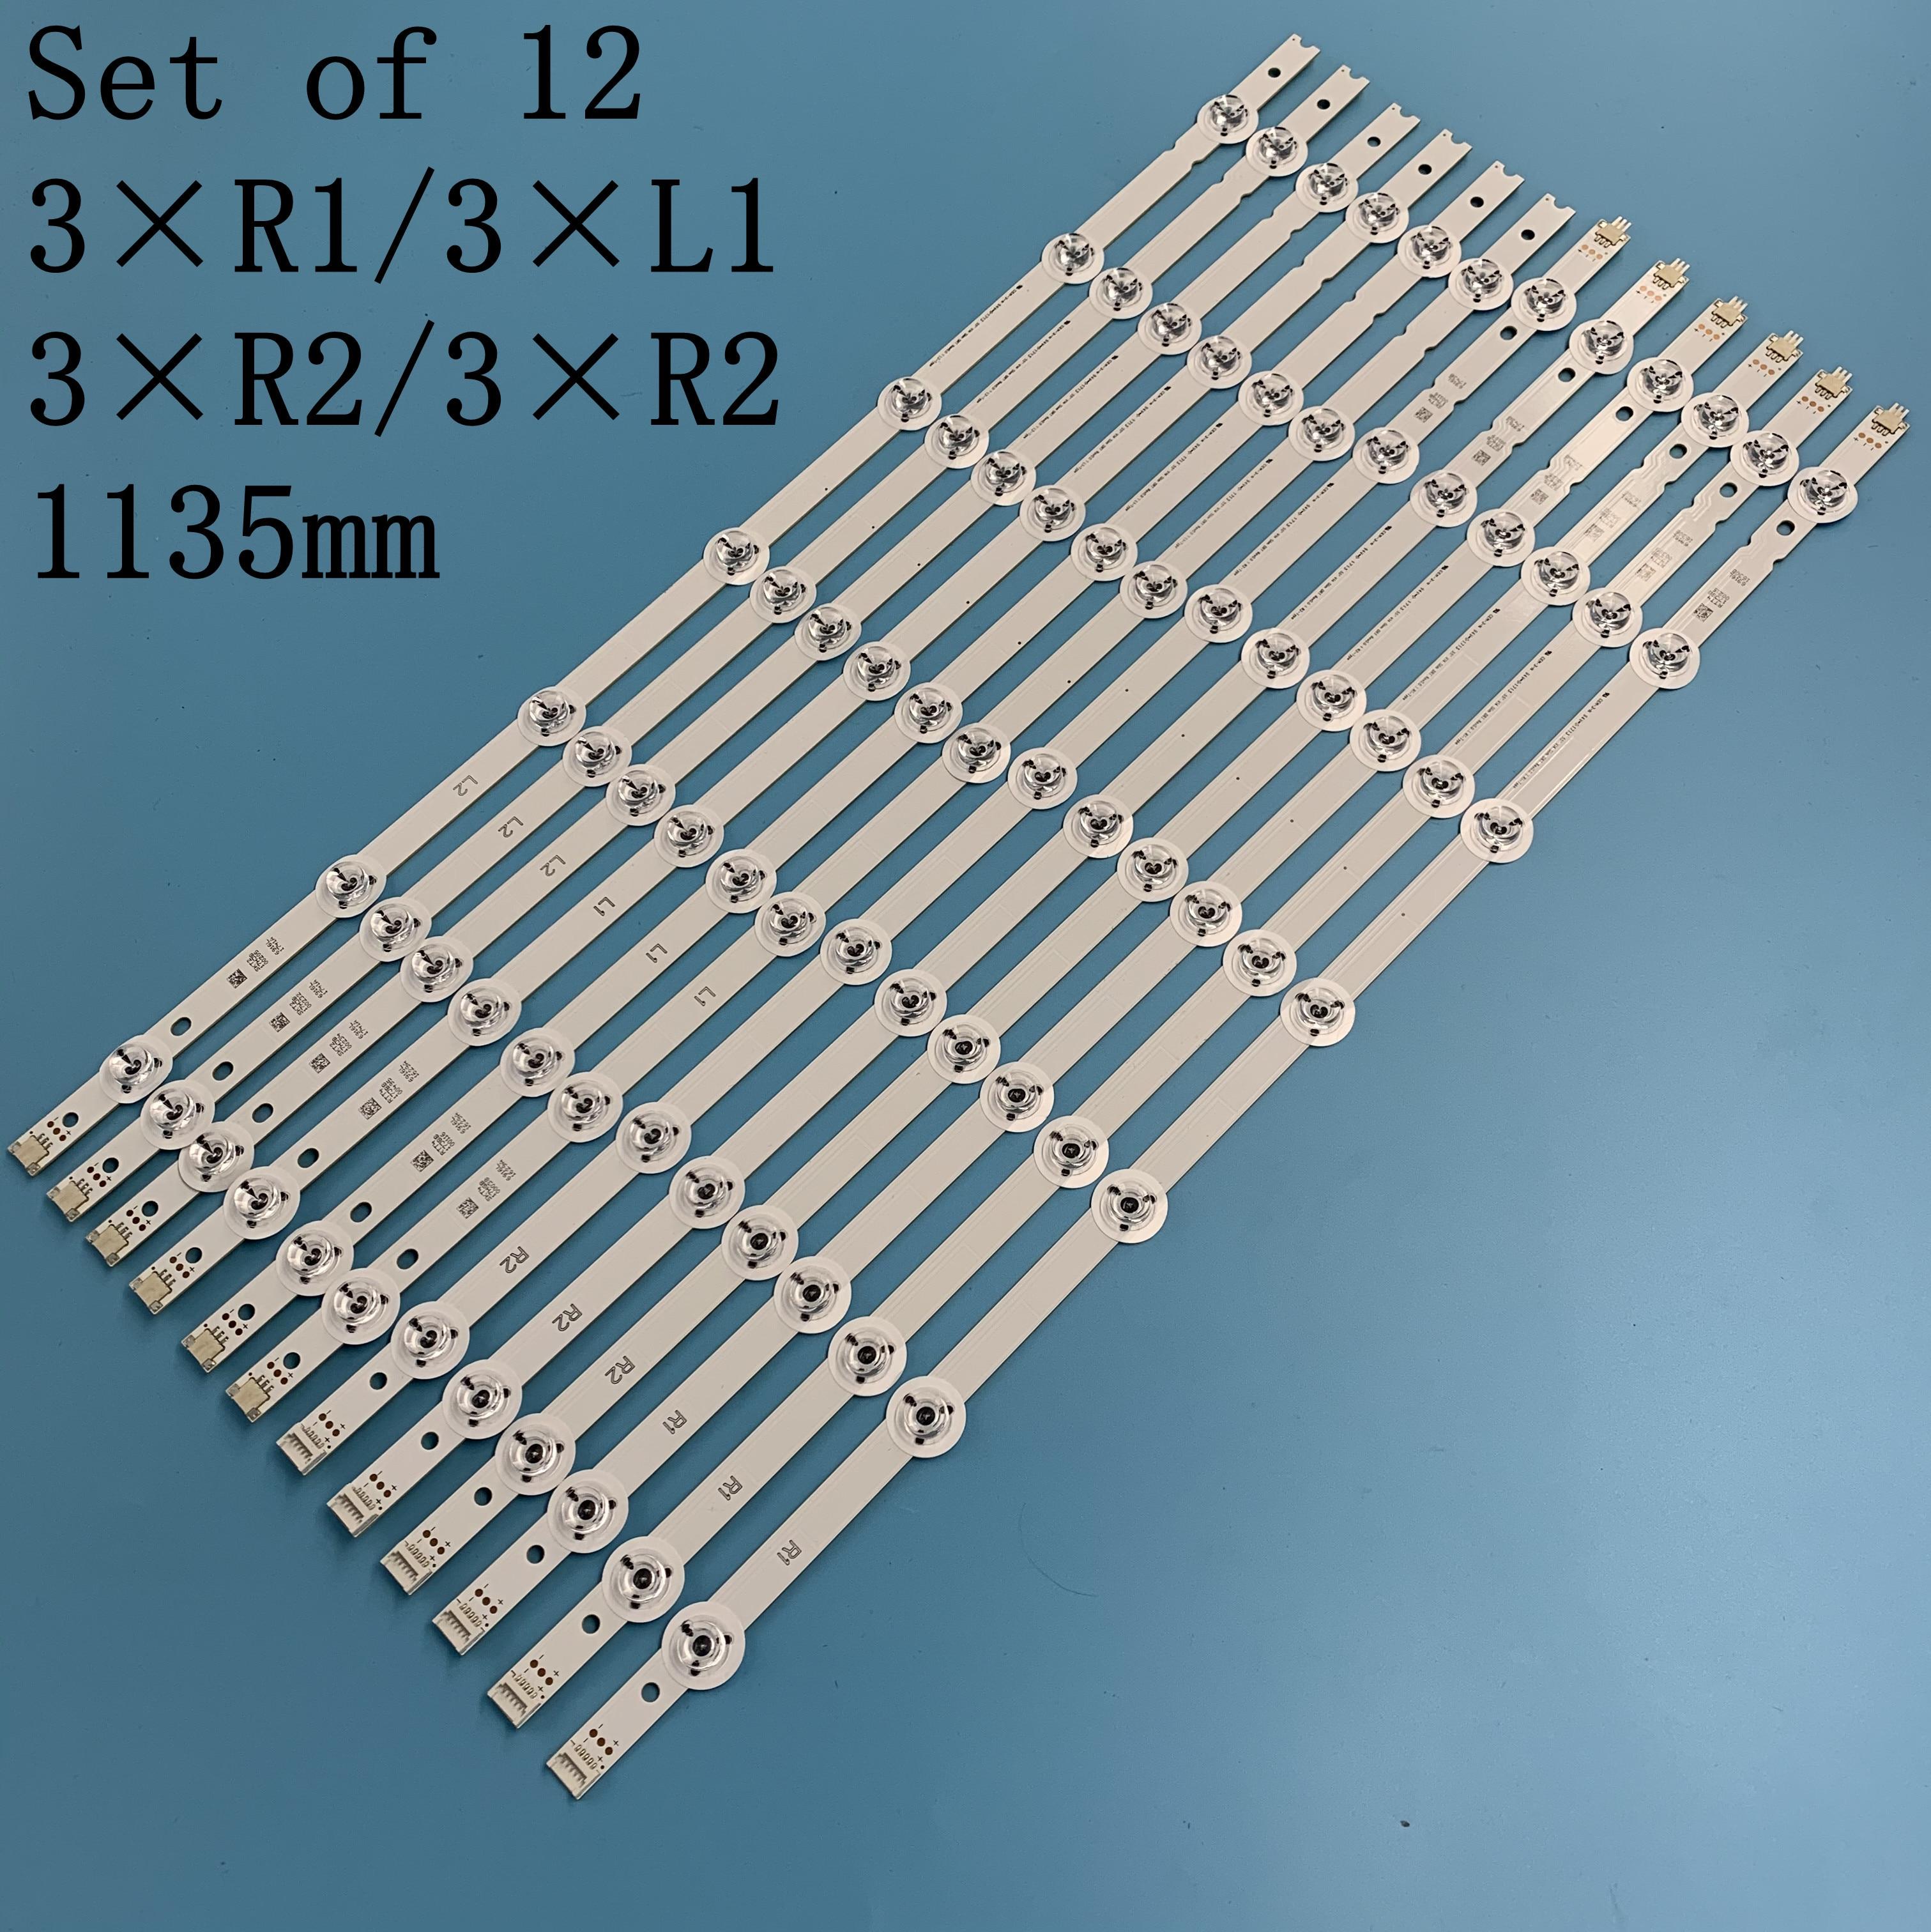 12pcs LED Strip For LG 55'' 55LB671V 55LB673V 55LB675V 55LB677V 55LB679V 55LB690V 55LB700V 55LB720V 55LB730V 55LB7200 55LB670V